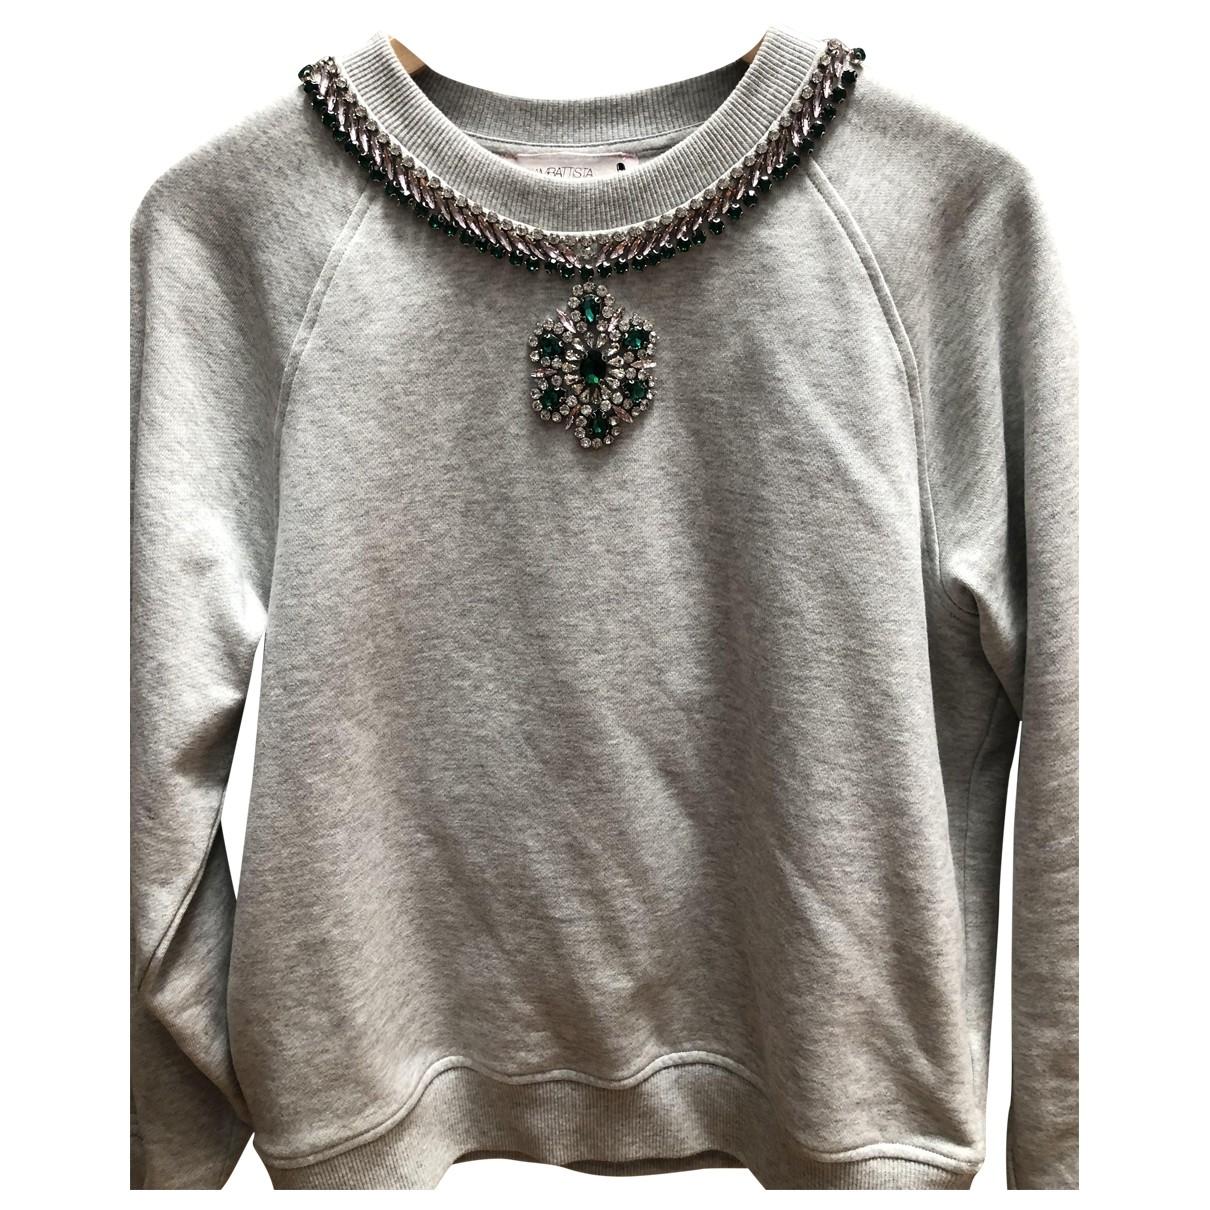 Giambattista Valli X H&m - Pull   pour femme en coton - gris